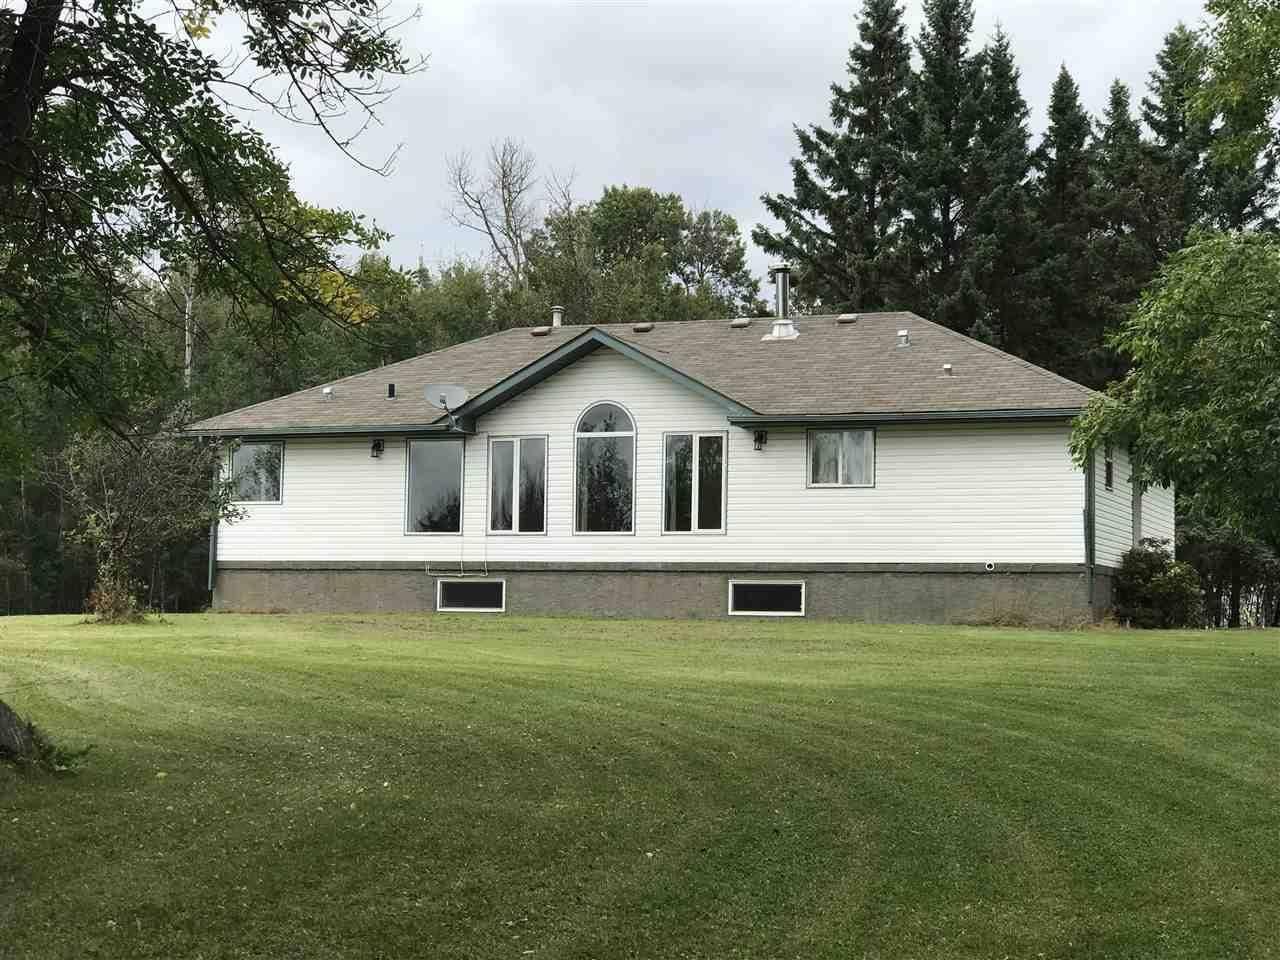 House for sale at 18 Rg Rd N Rural Thorhild County Alberta - MLS: E4172243